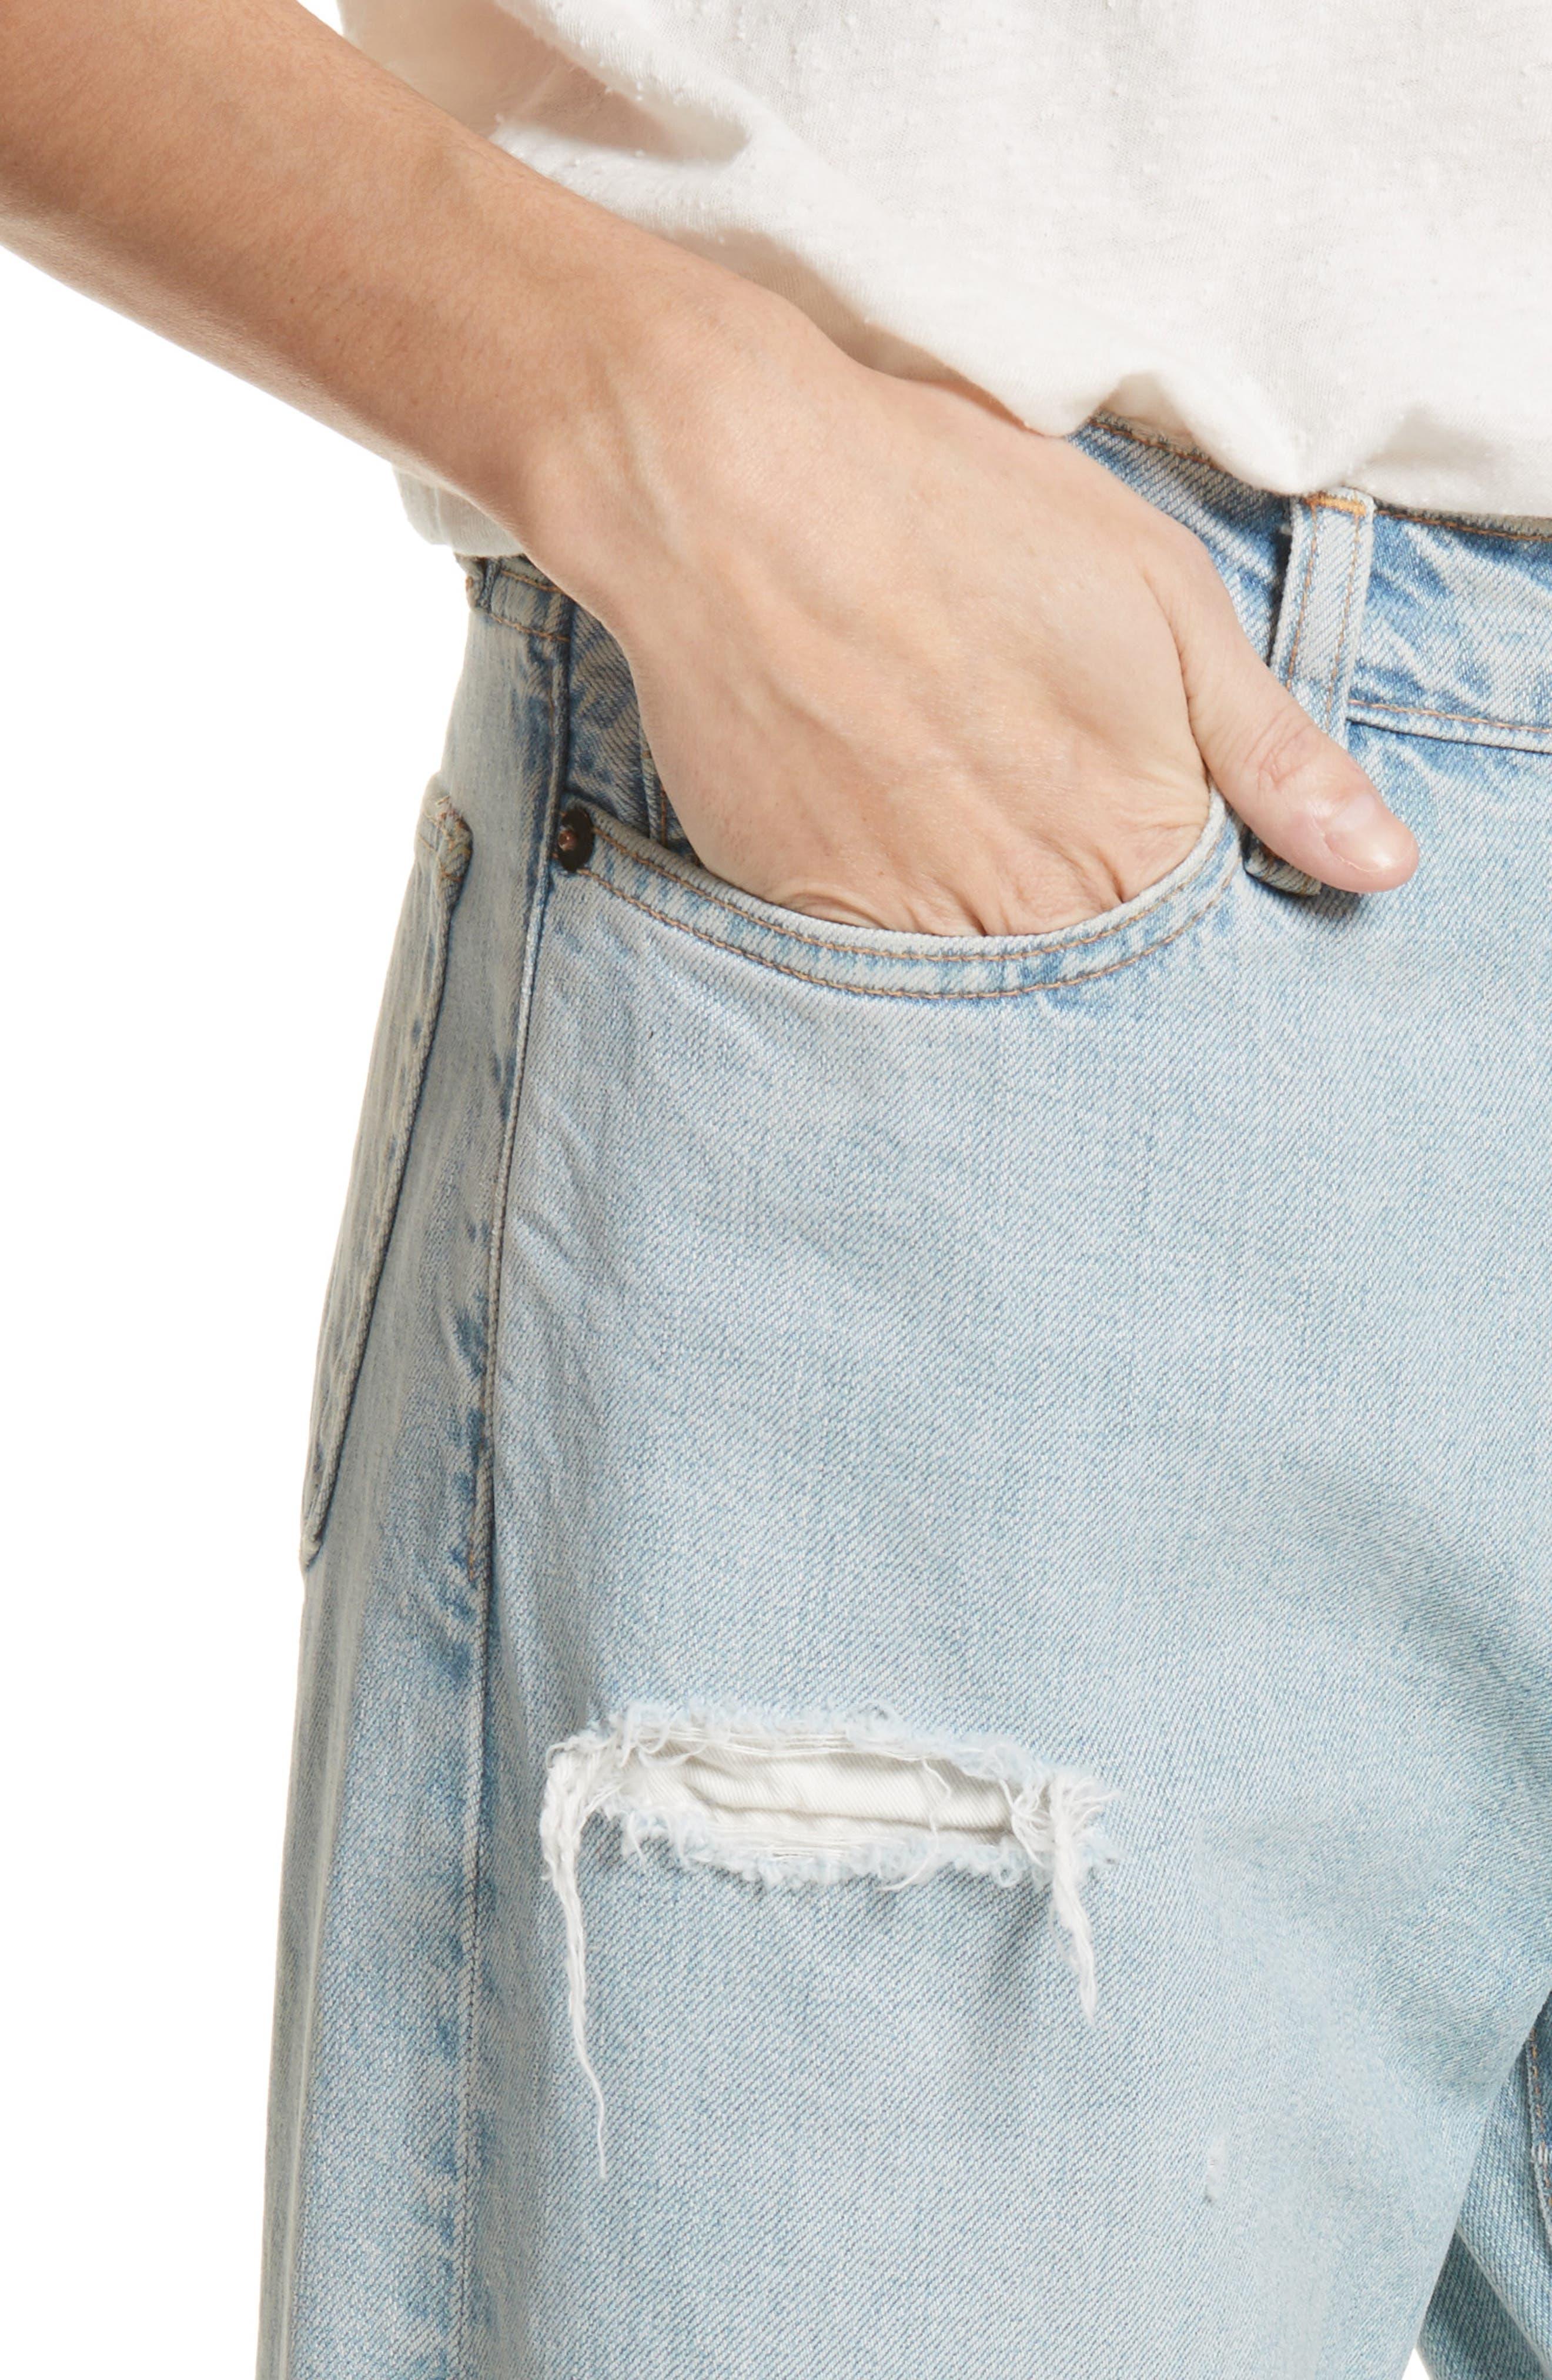 Tibbee Ripped Jeans,                             Alternate thumbnail 5, color,                             Light Indigo